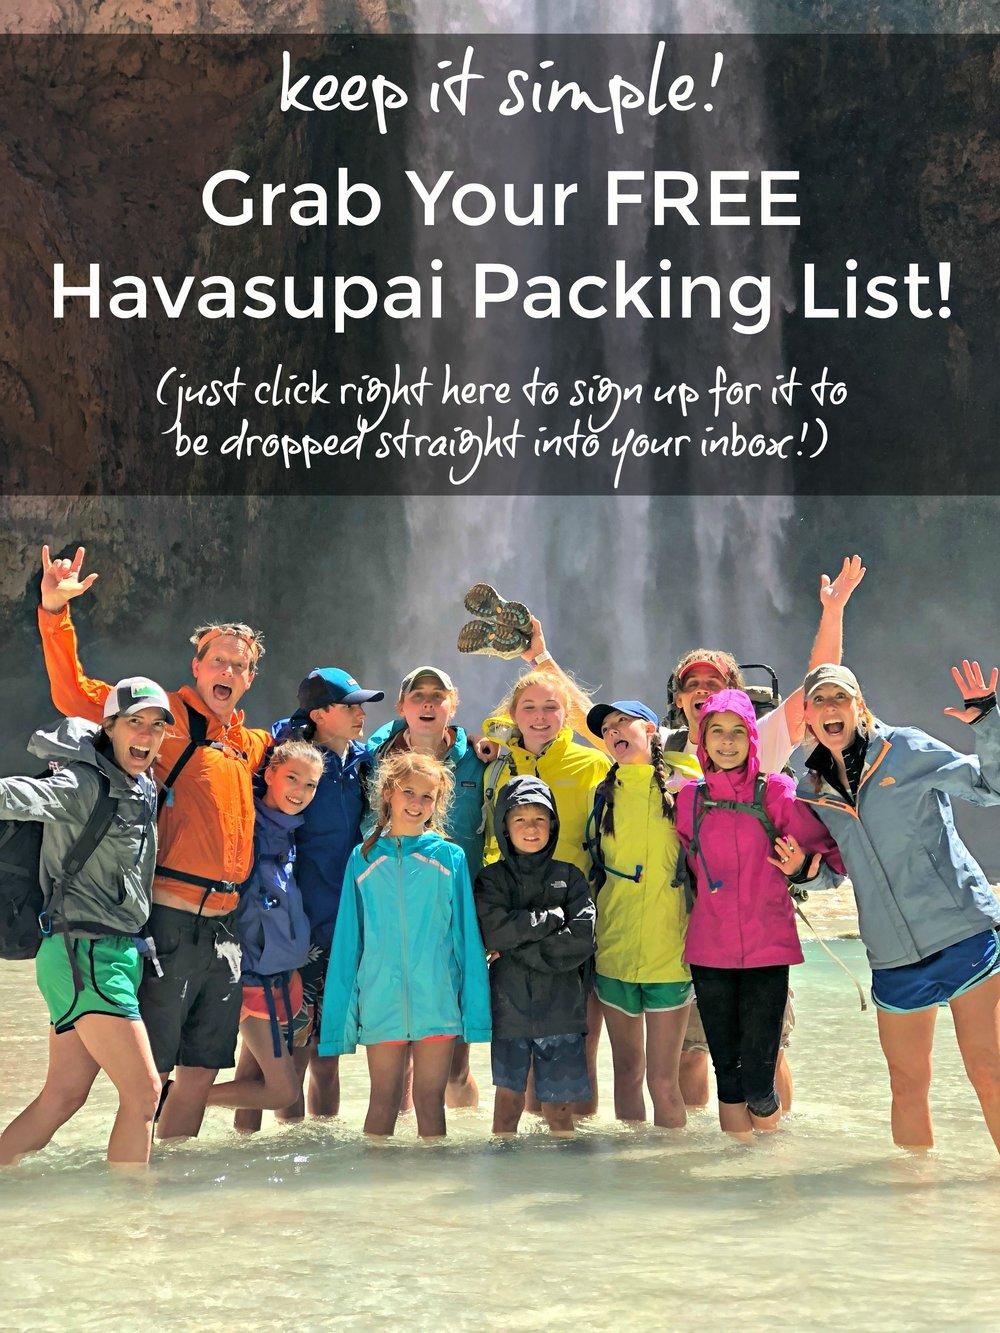 Free Havasupai packing camping list